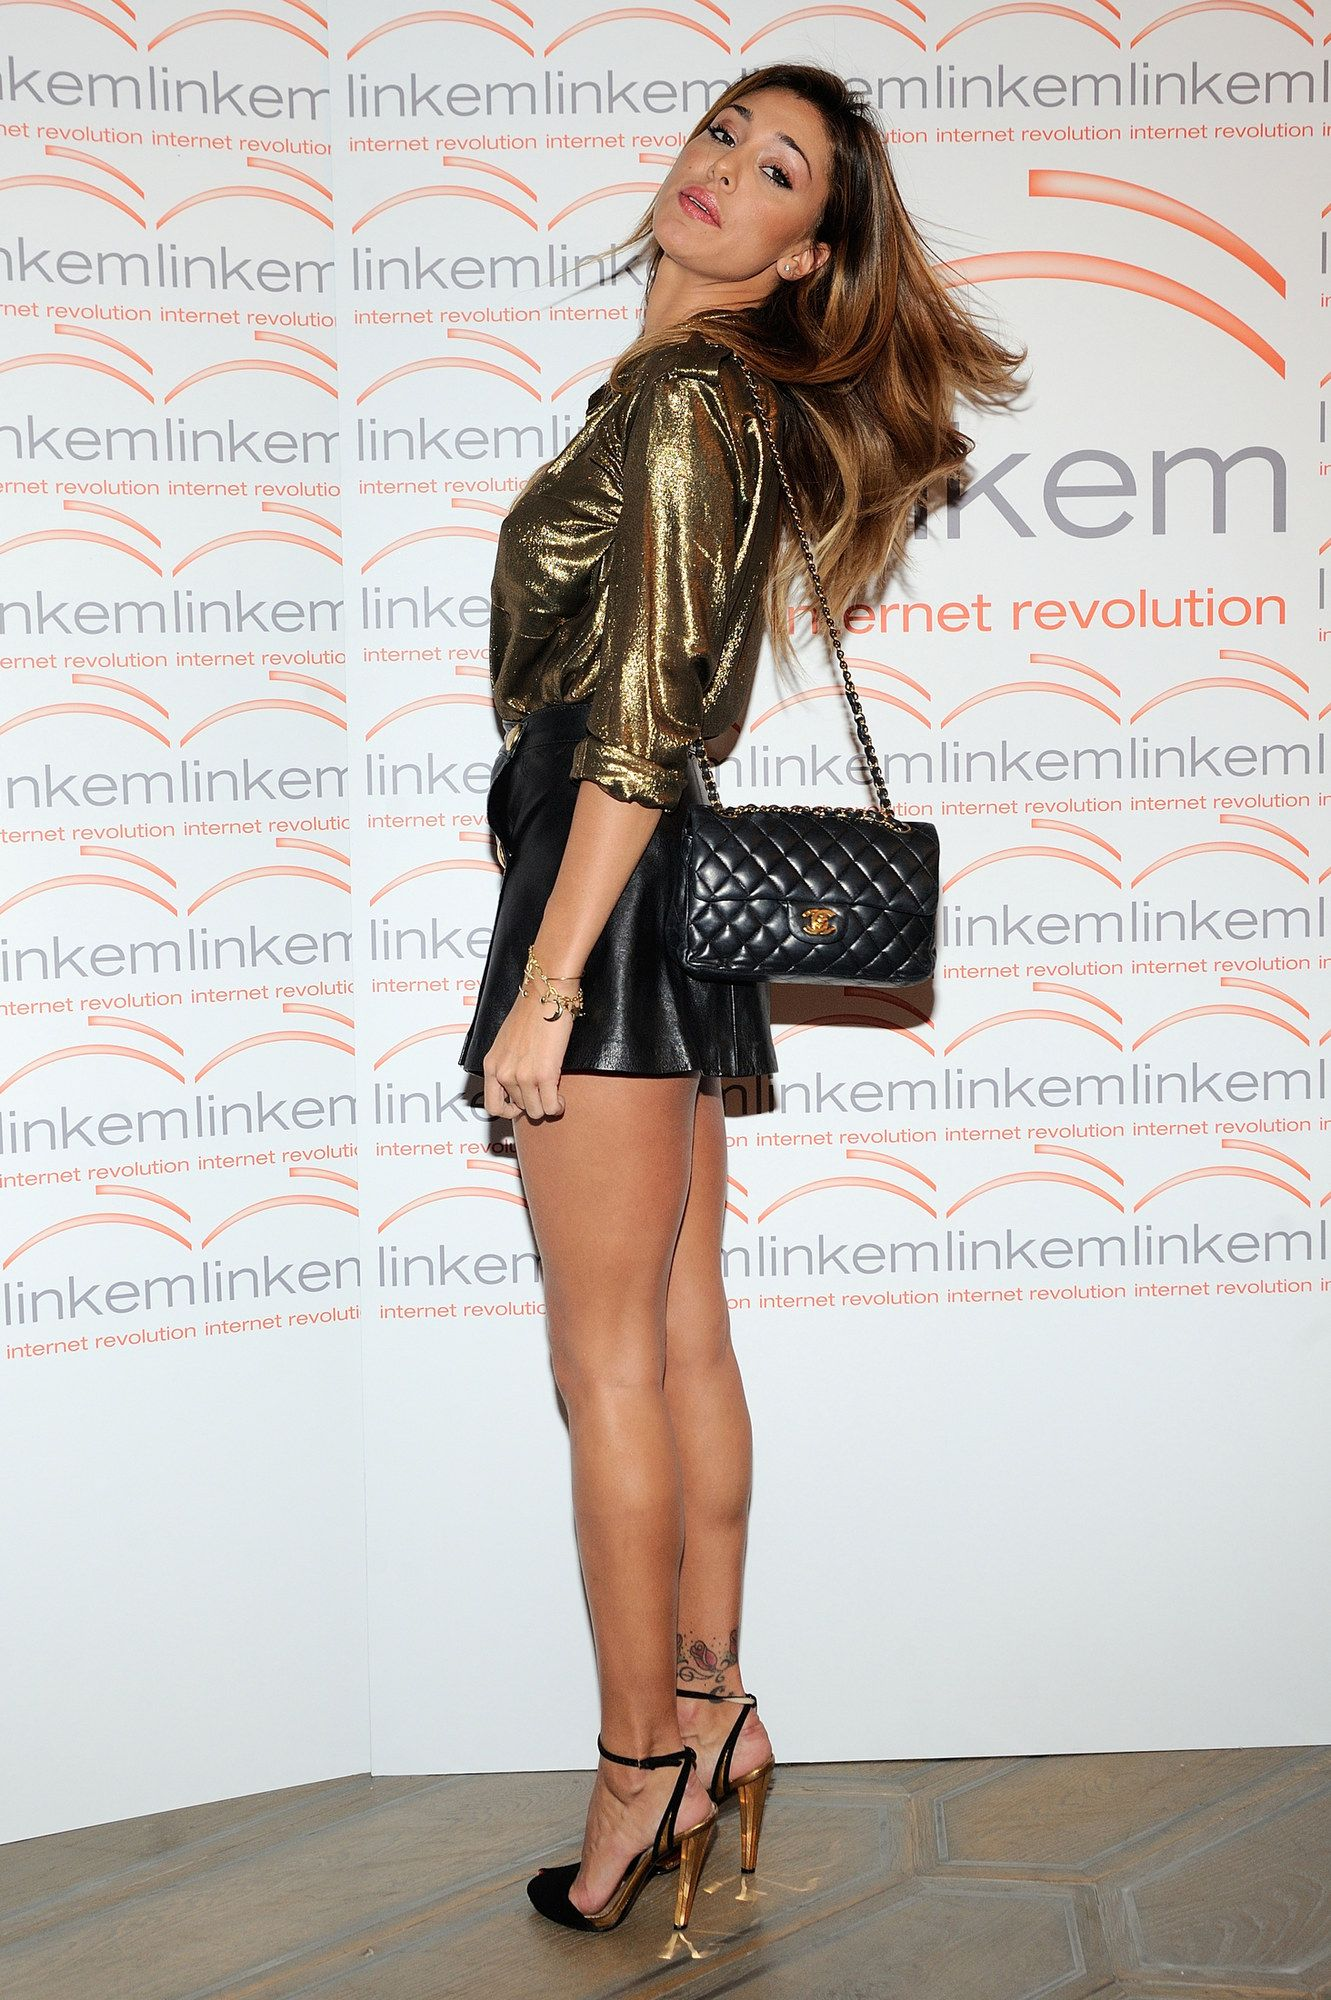 Belén Rodríguez - Glitter blouse, Black leather skirt, Black ...